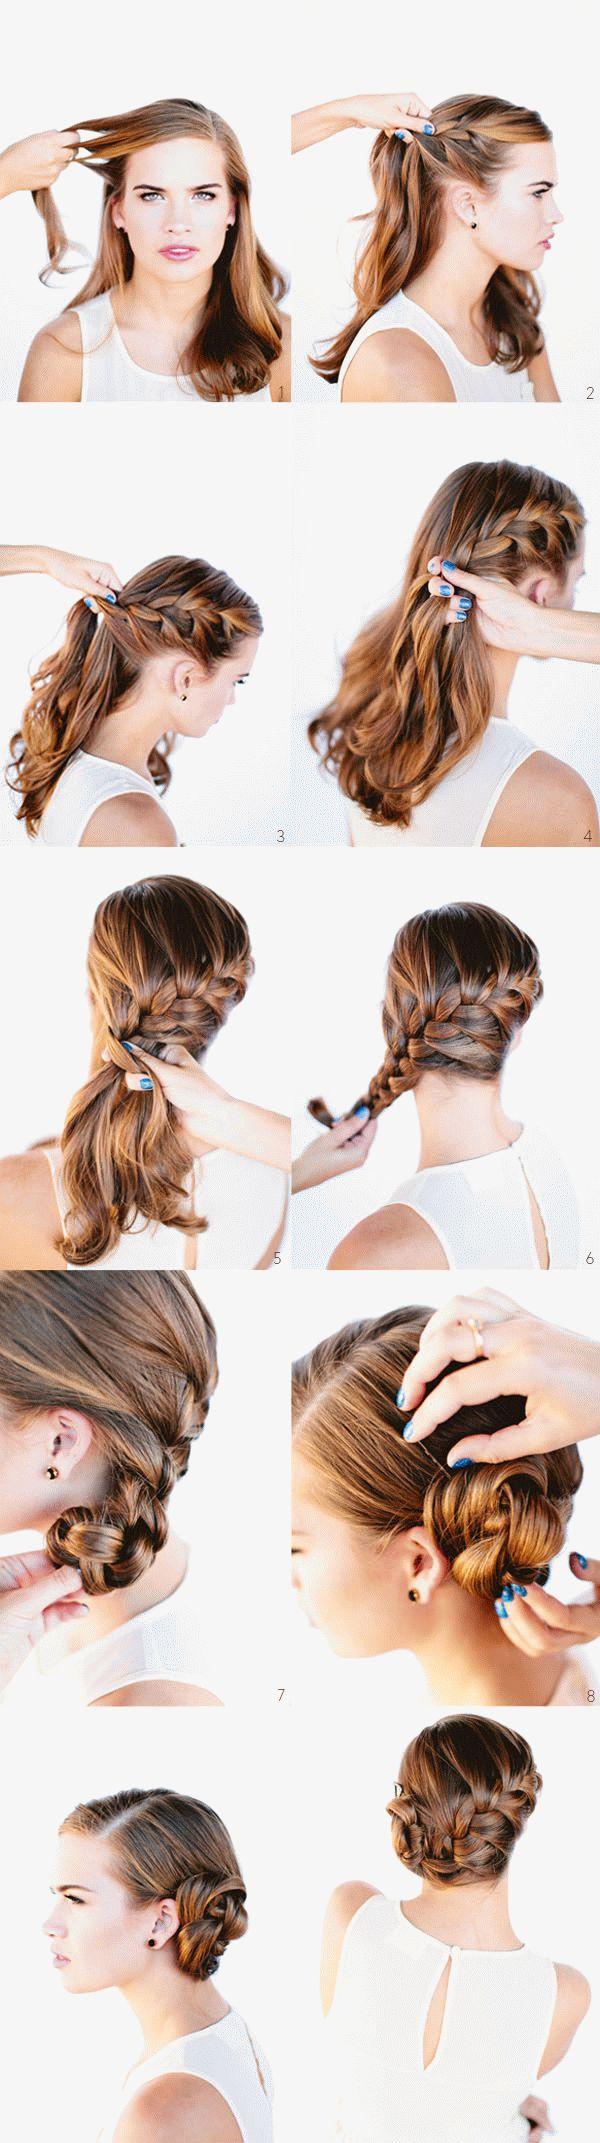 Easy Hair Tutorials (For long and short hair)